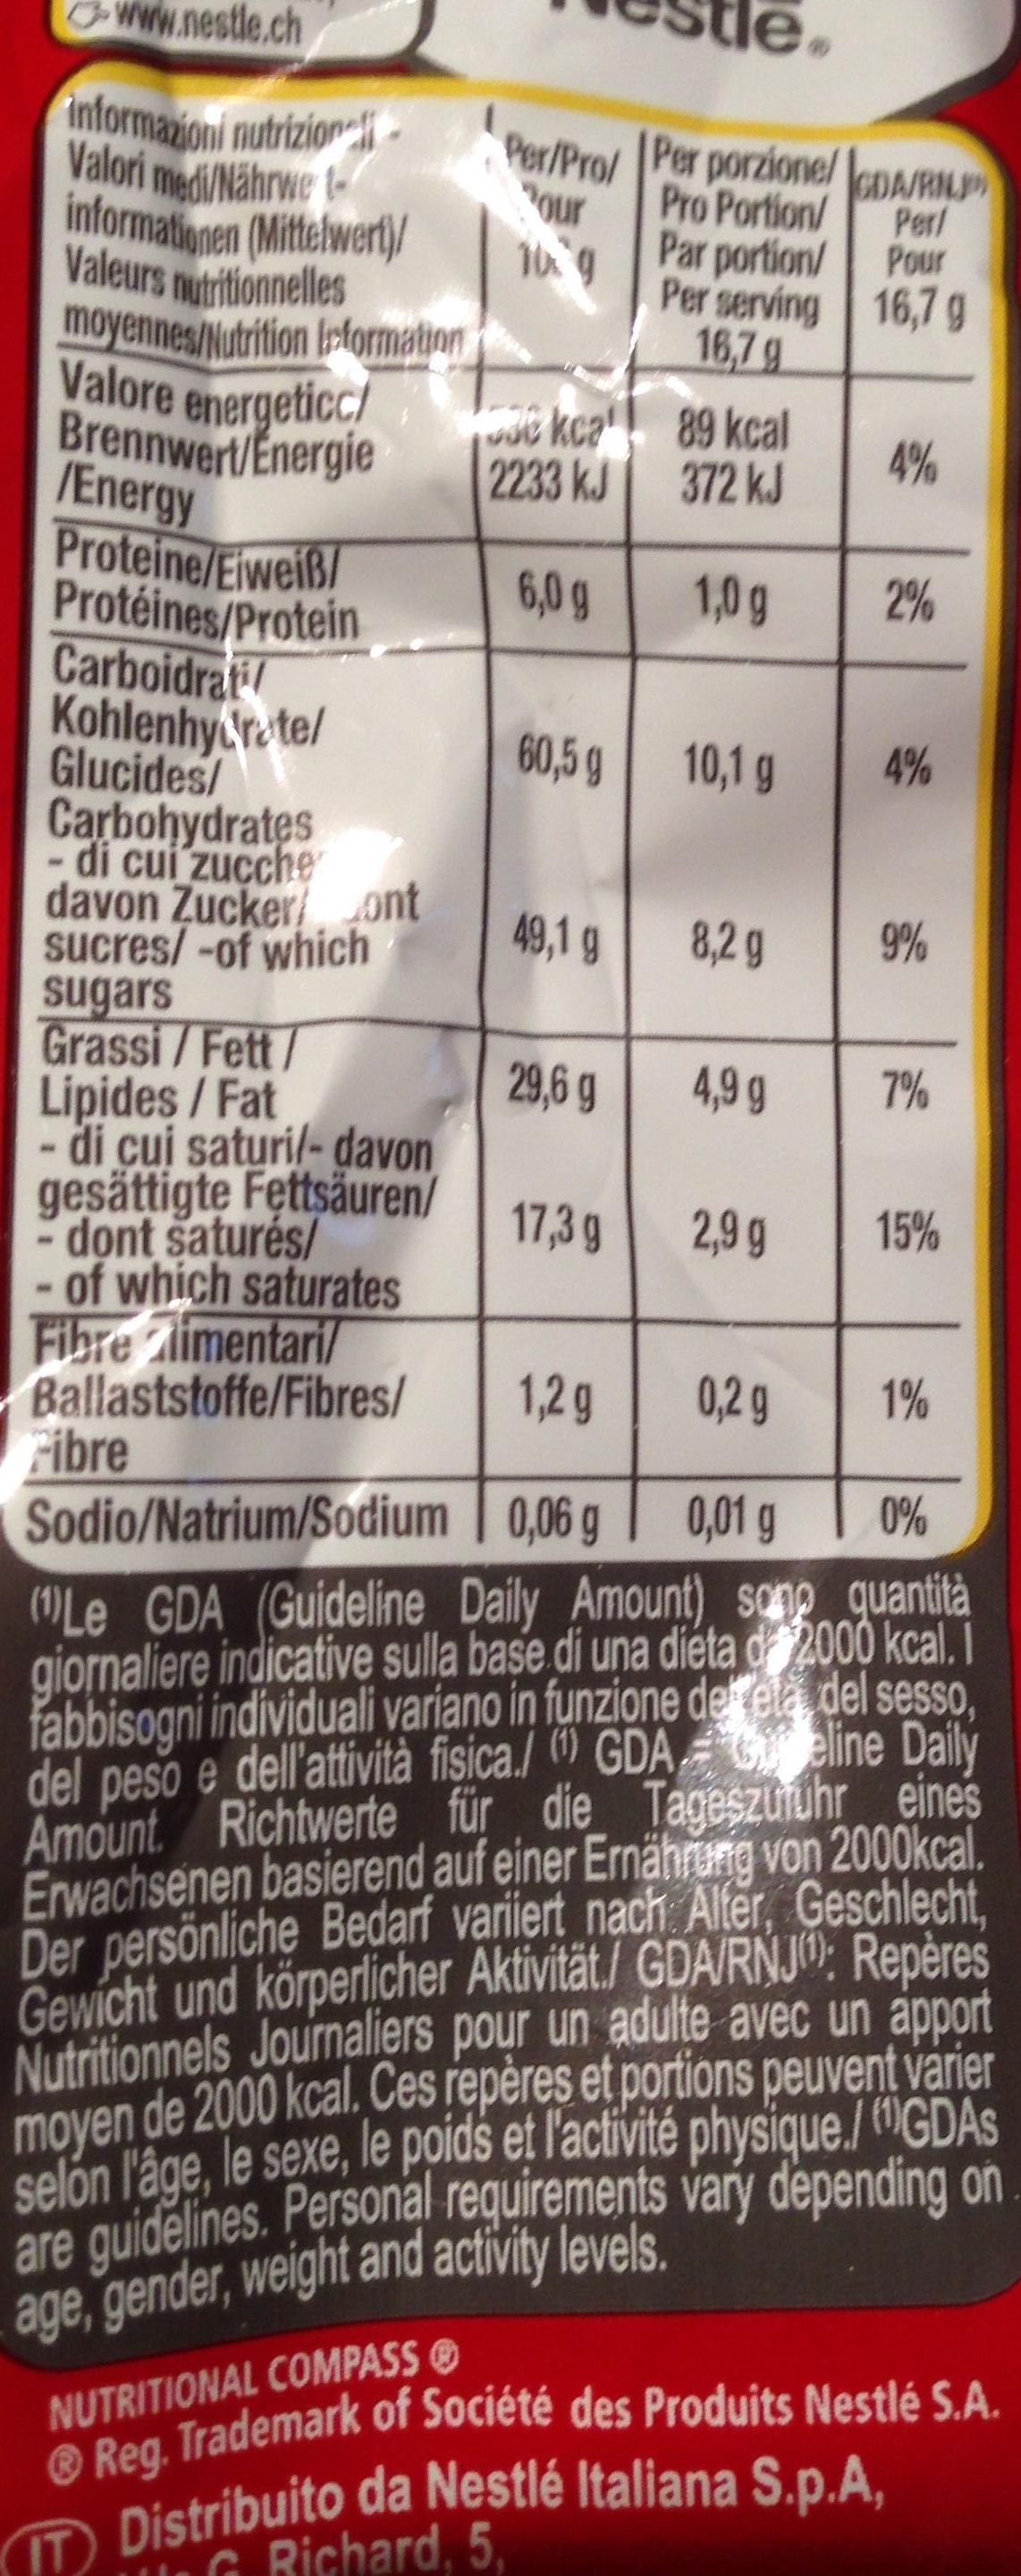 Kit Kat Mini Nutritional Information Besto Blog